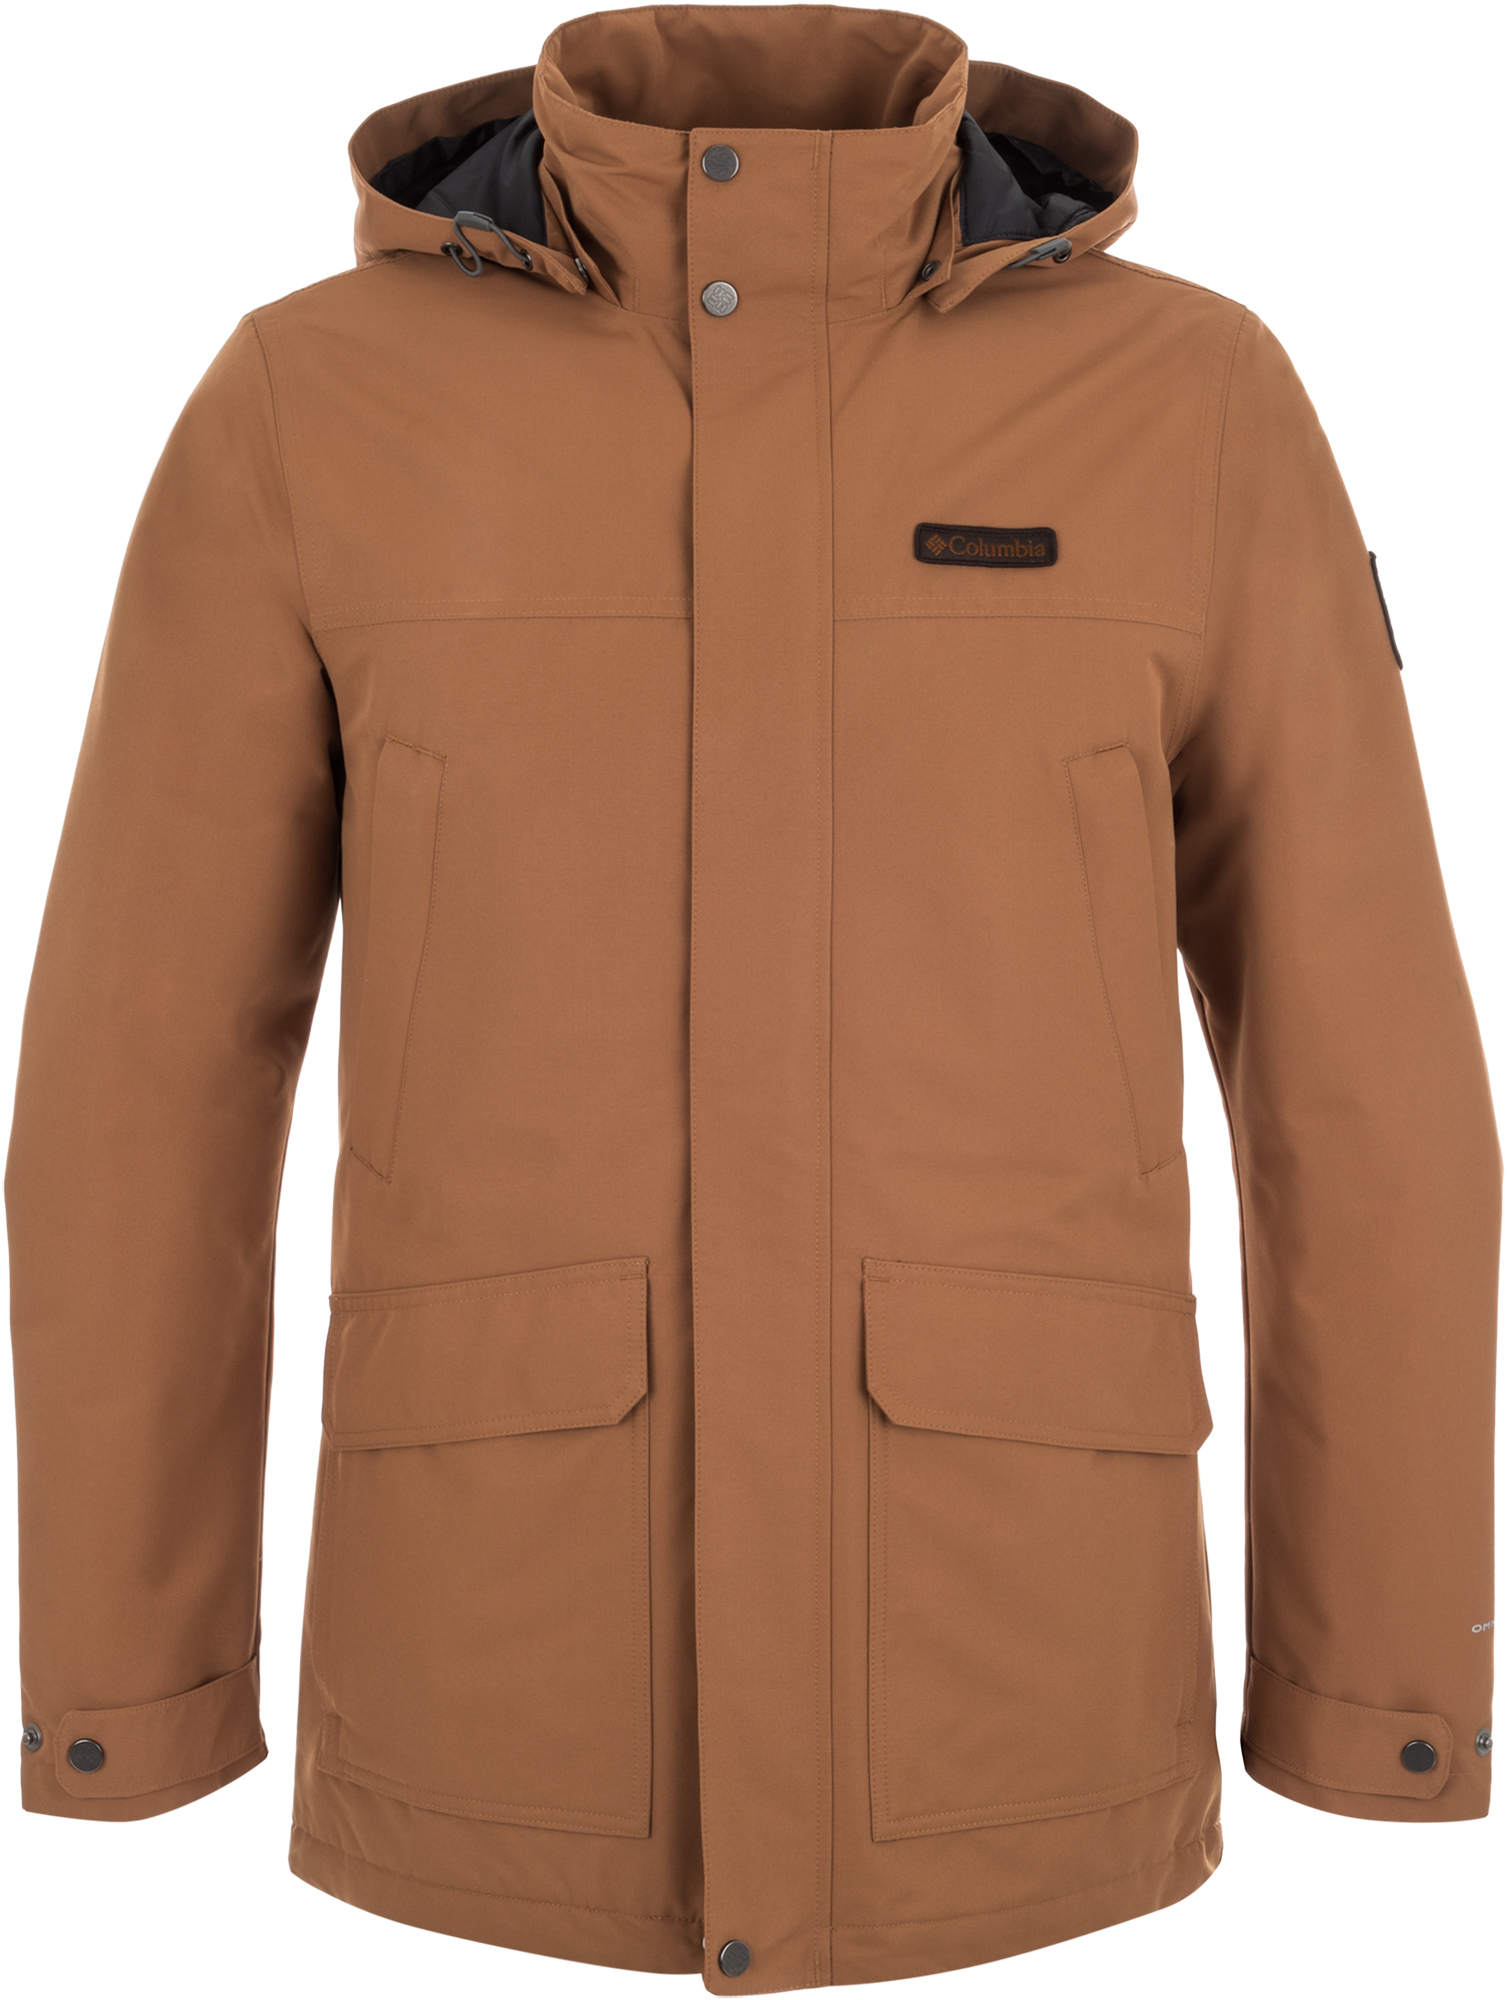 Columbia Куртка утепленная мужская Columbia Inverness, размер 56-58 цена